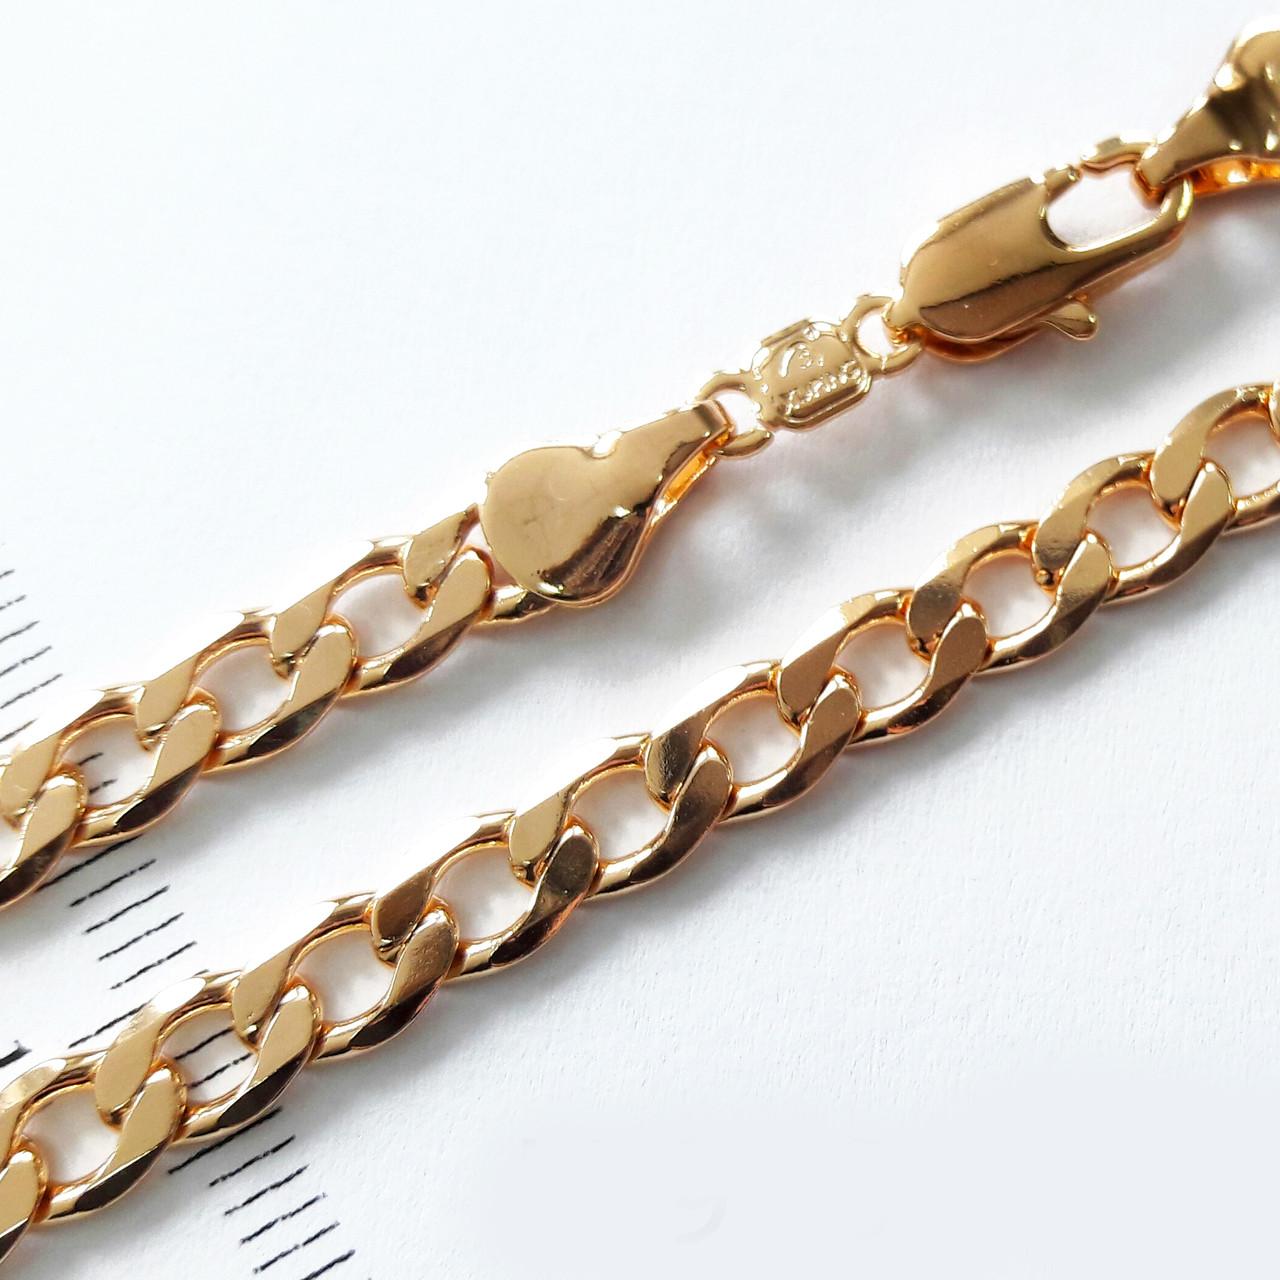 Цепочка xuping 5мм 60см панцирное плетение ц351, фото 1